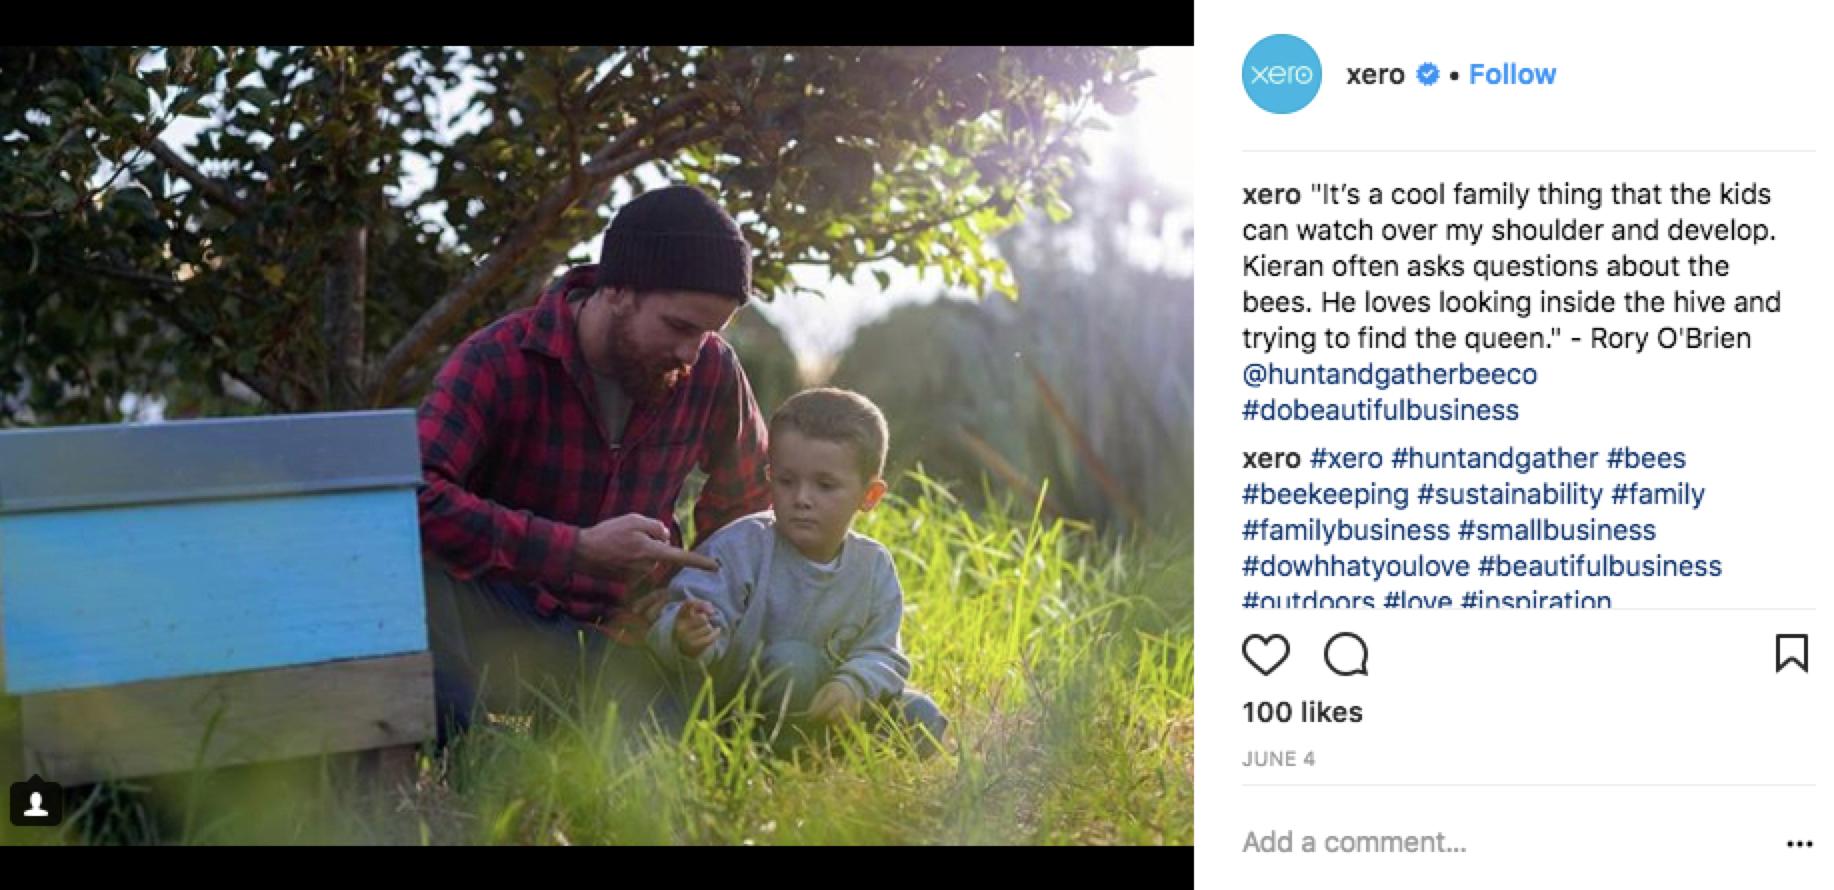 Xero Instagram post showing customer story